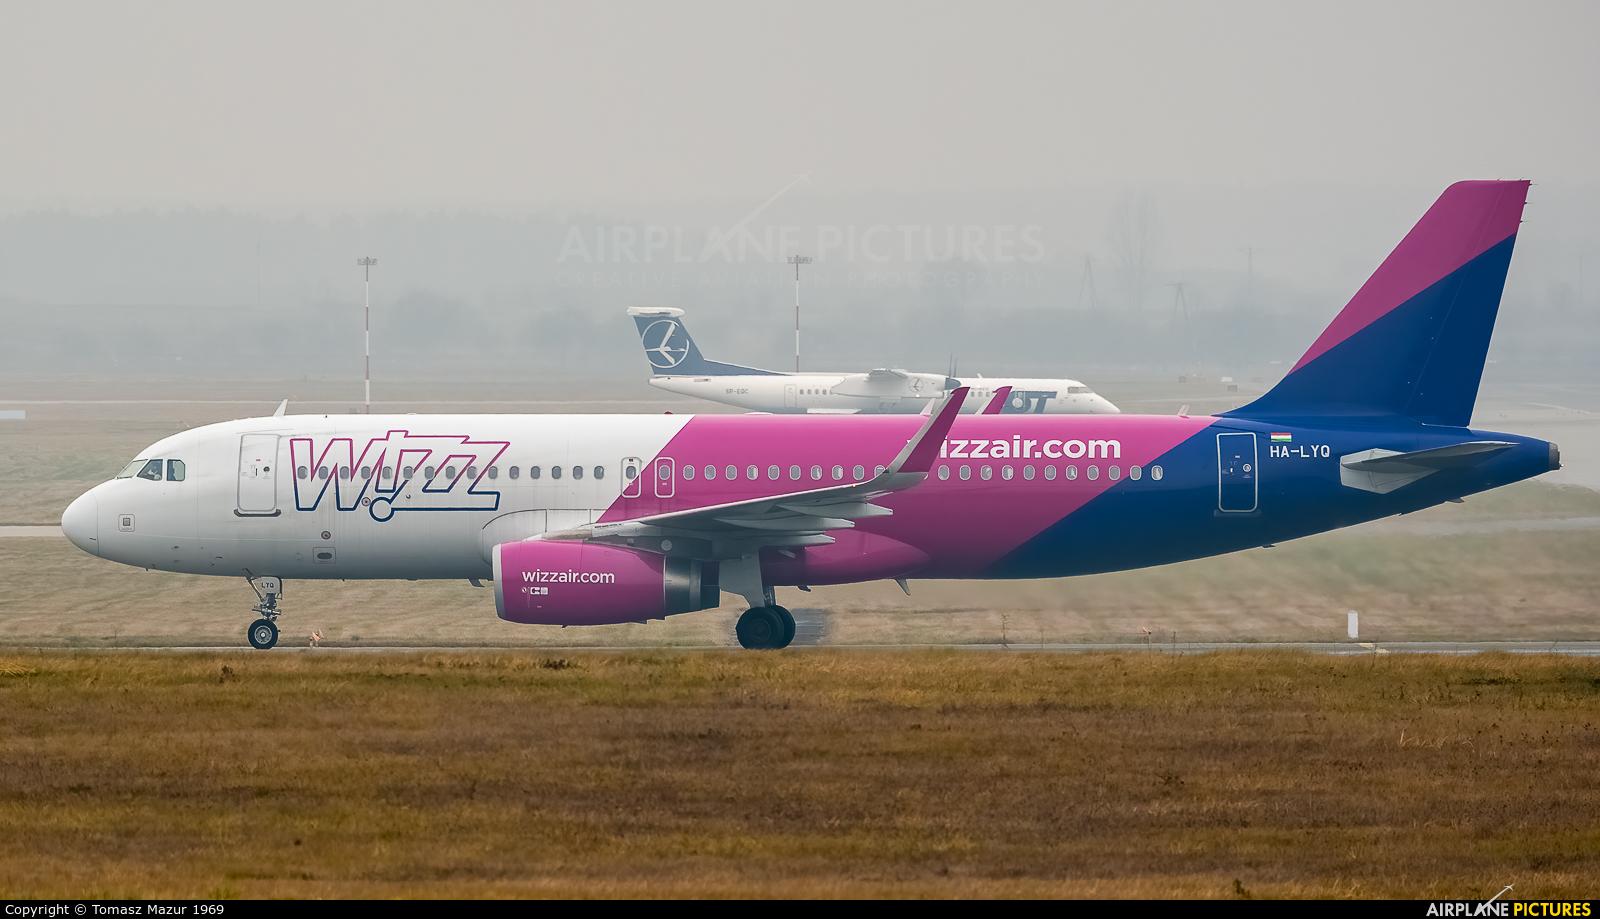 Wizz Air HA-LYQ aircraft at Katowice - Pyrzowice